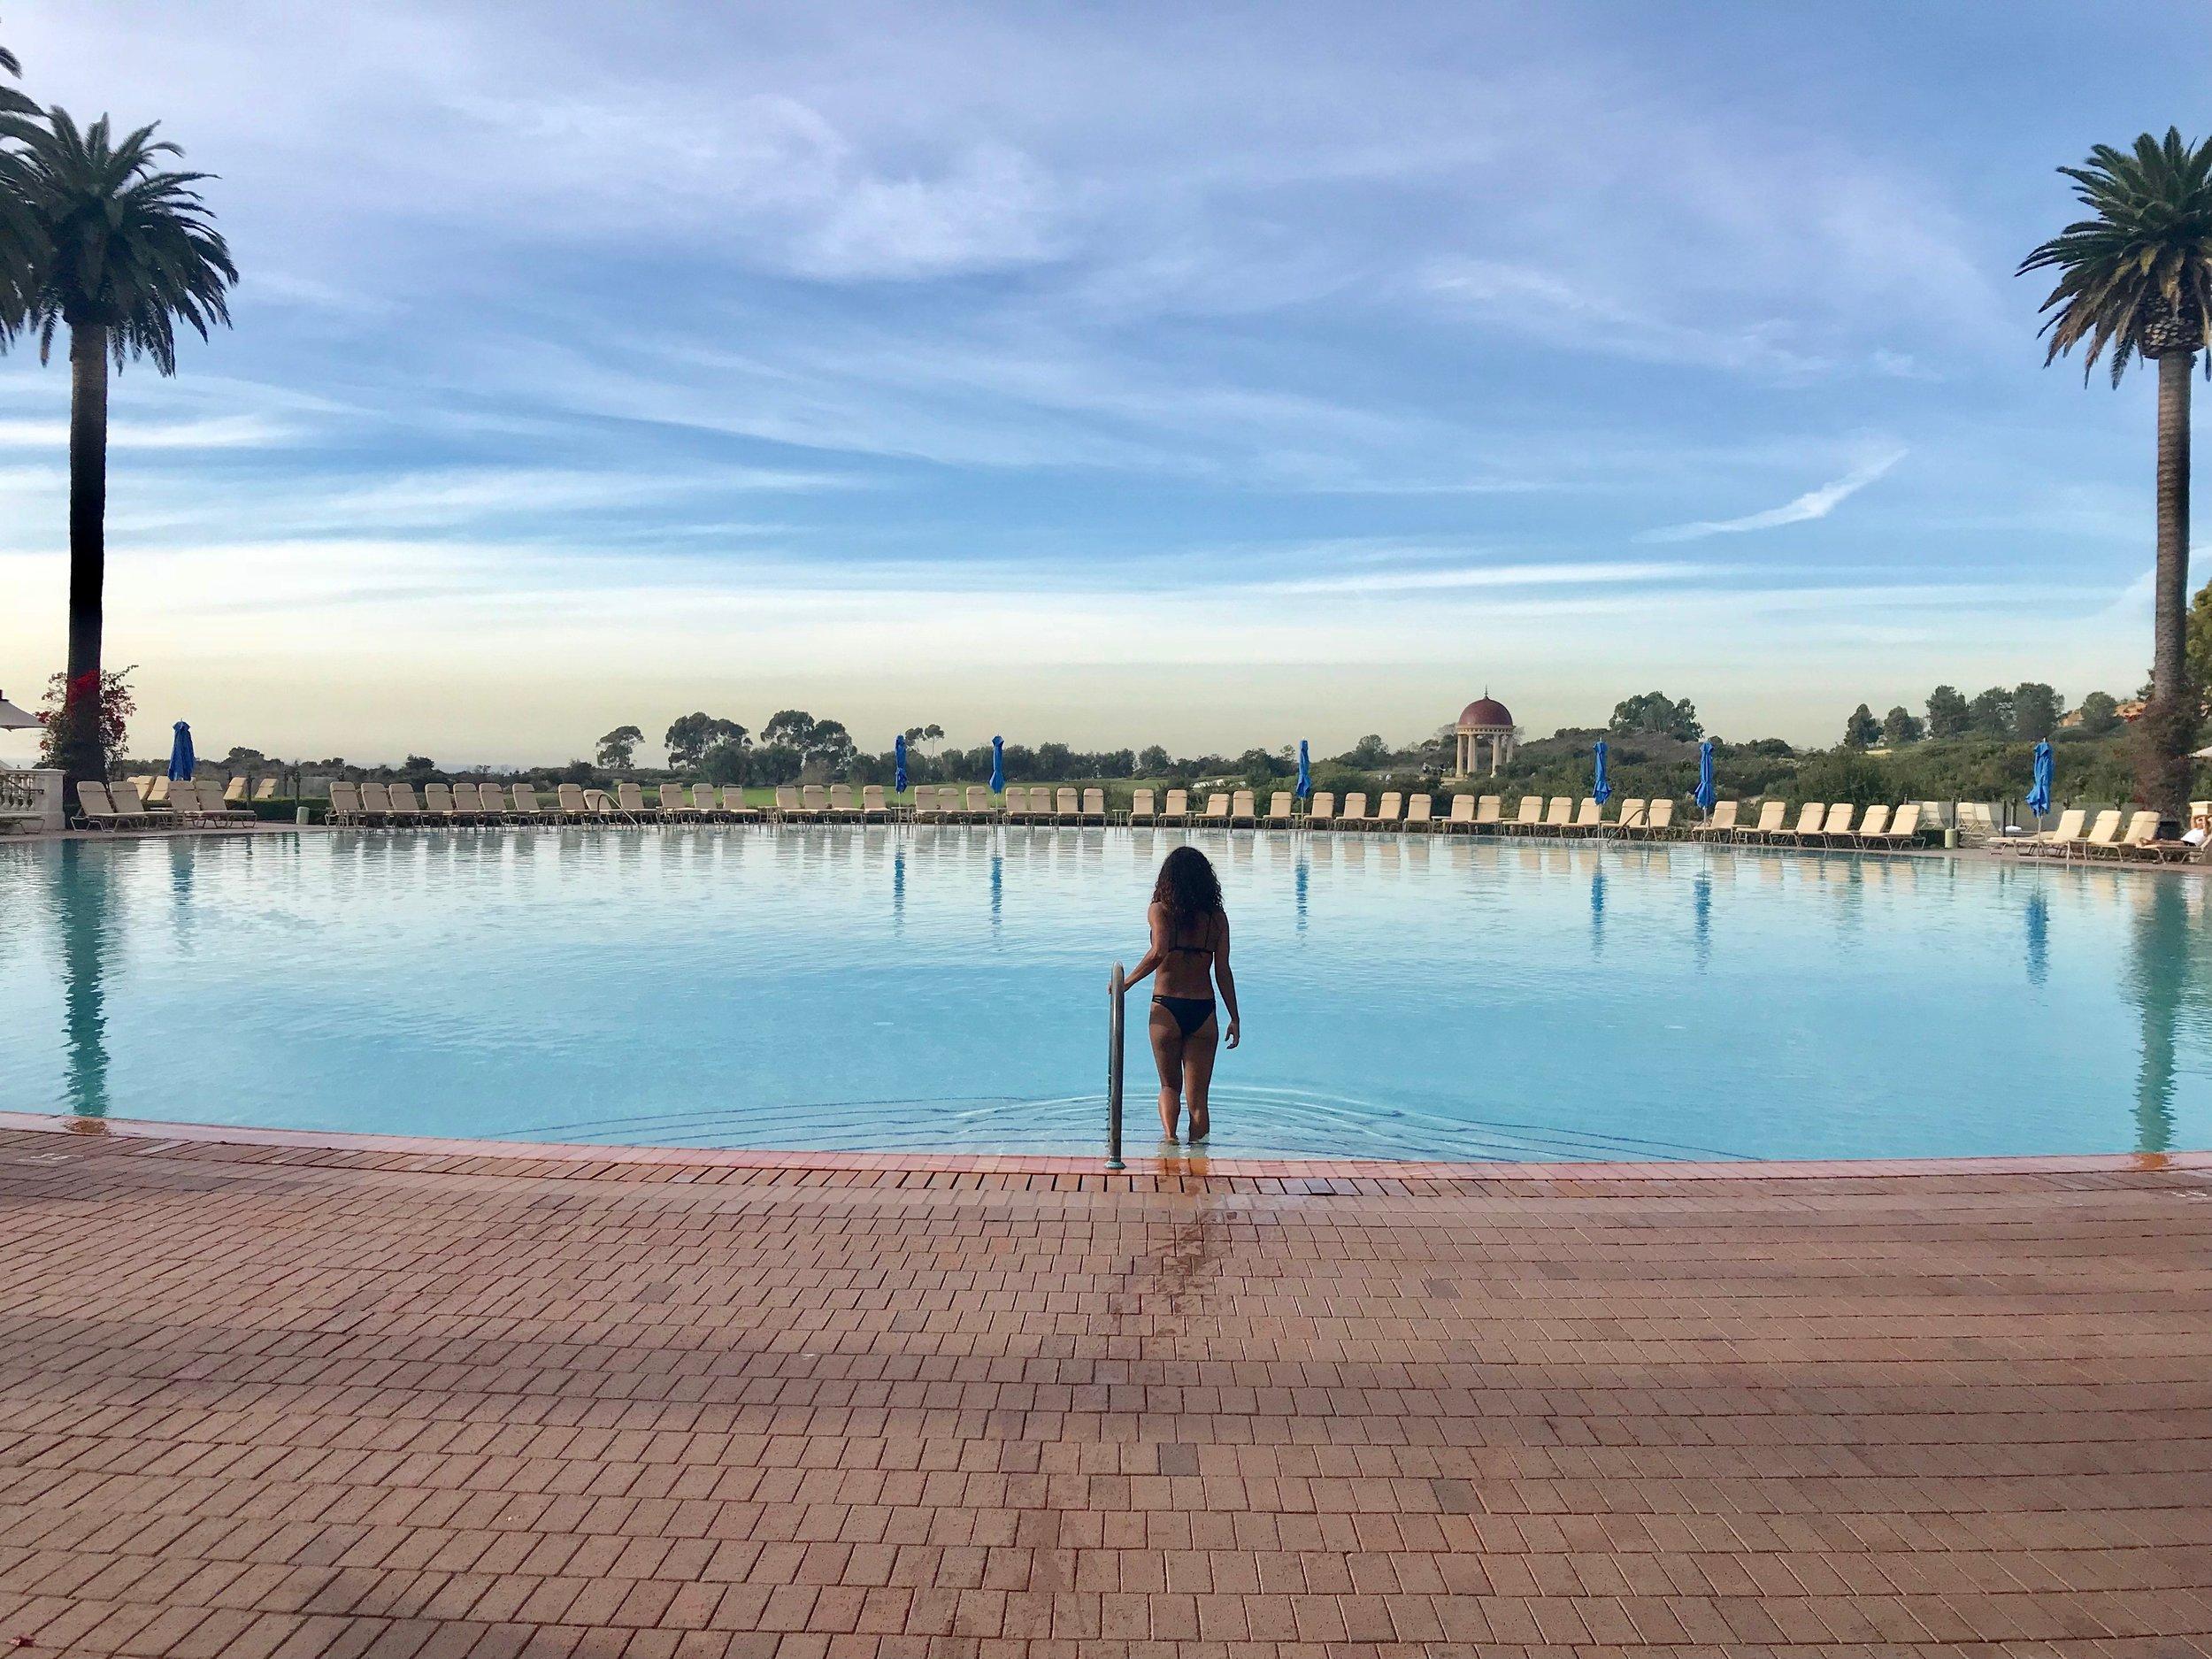 Stay at Pelican Hill Resort Newport Beach